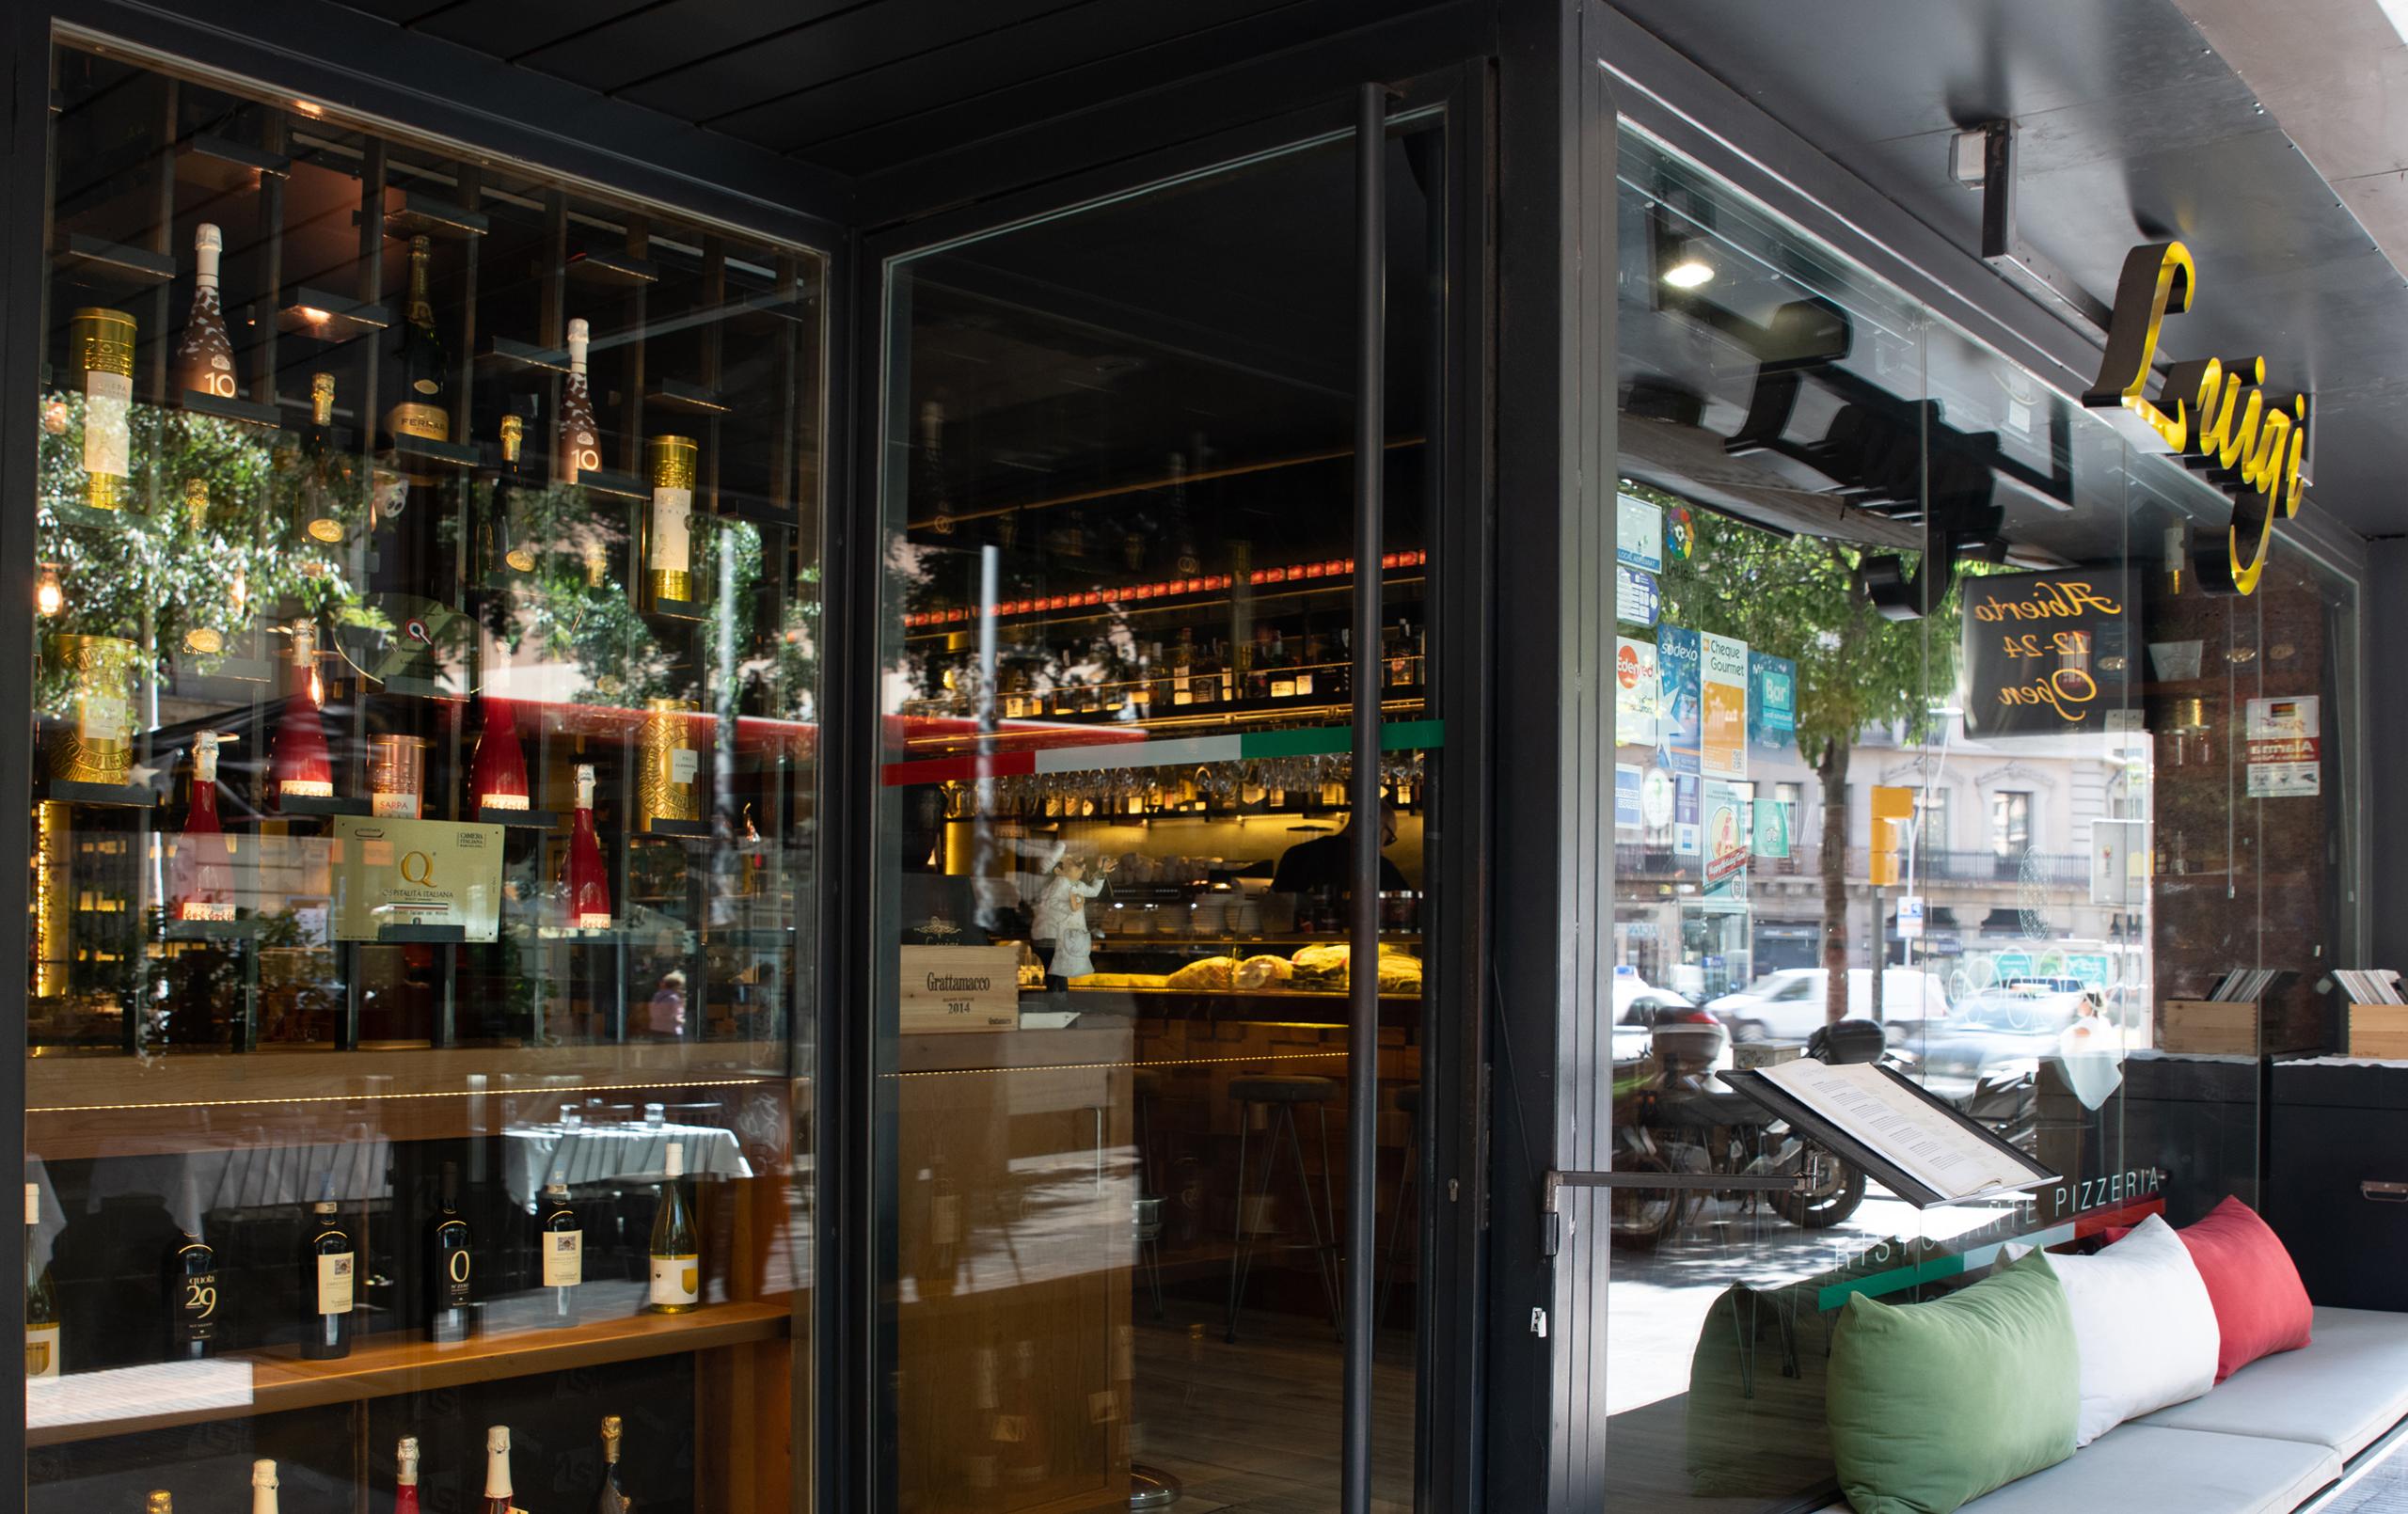 restaurante-italiano-napolitano-barcelona-luigi